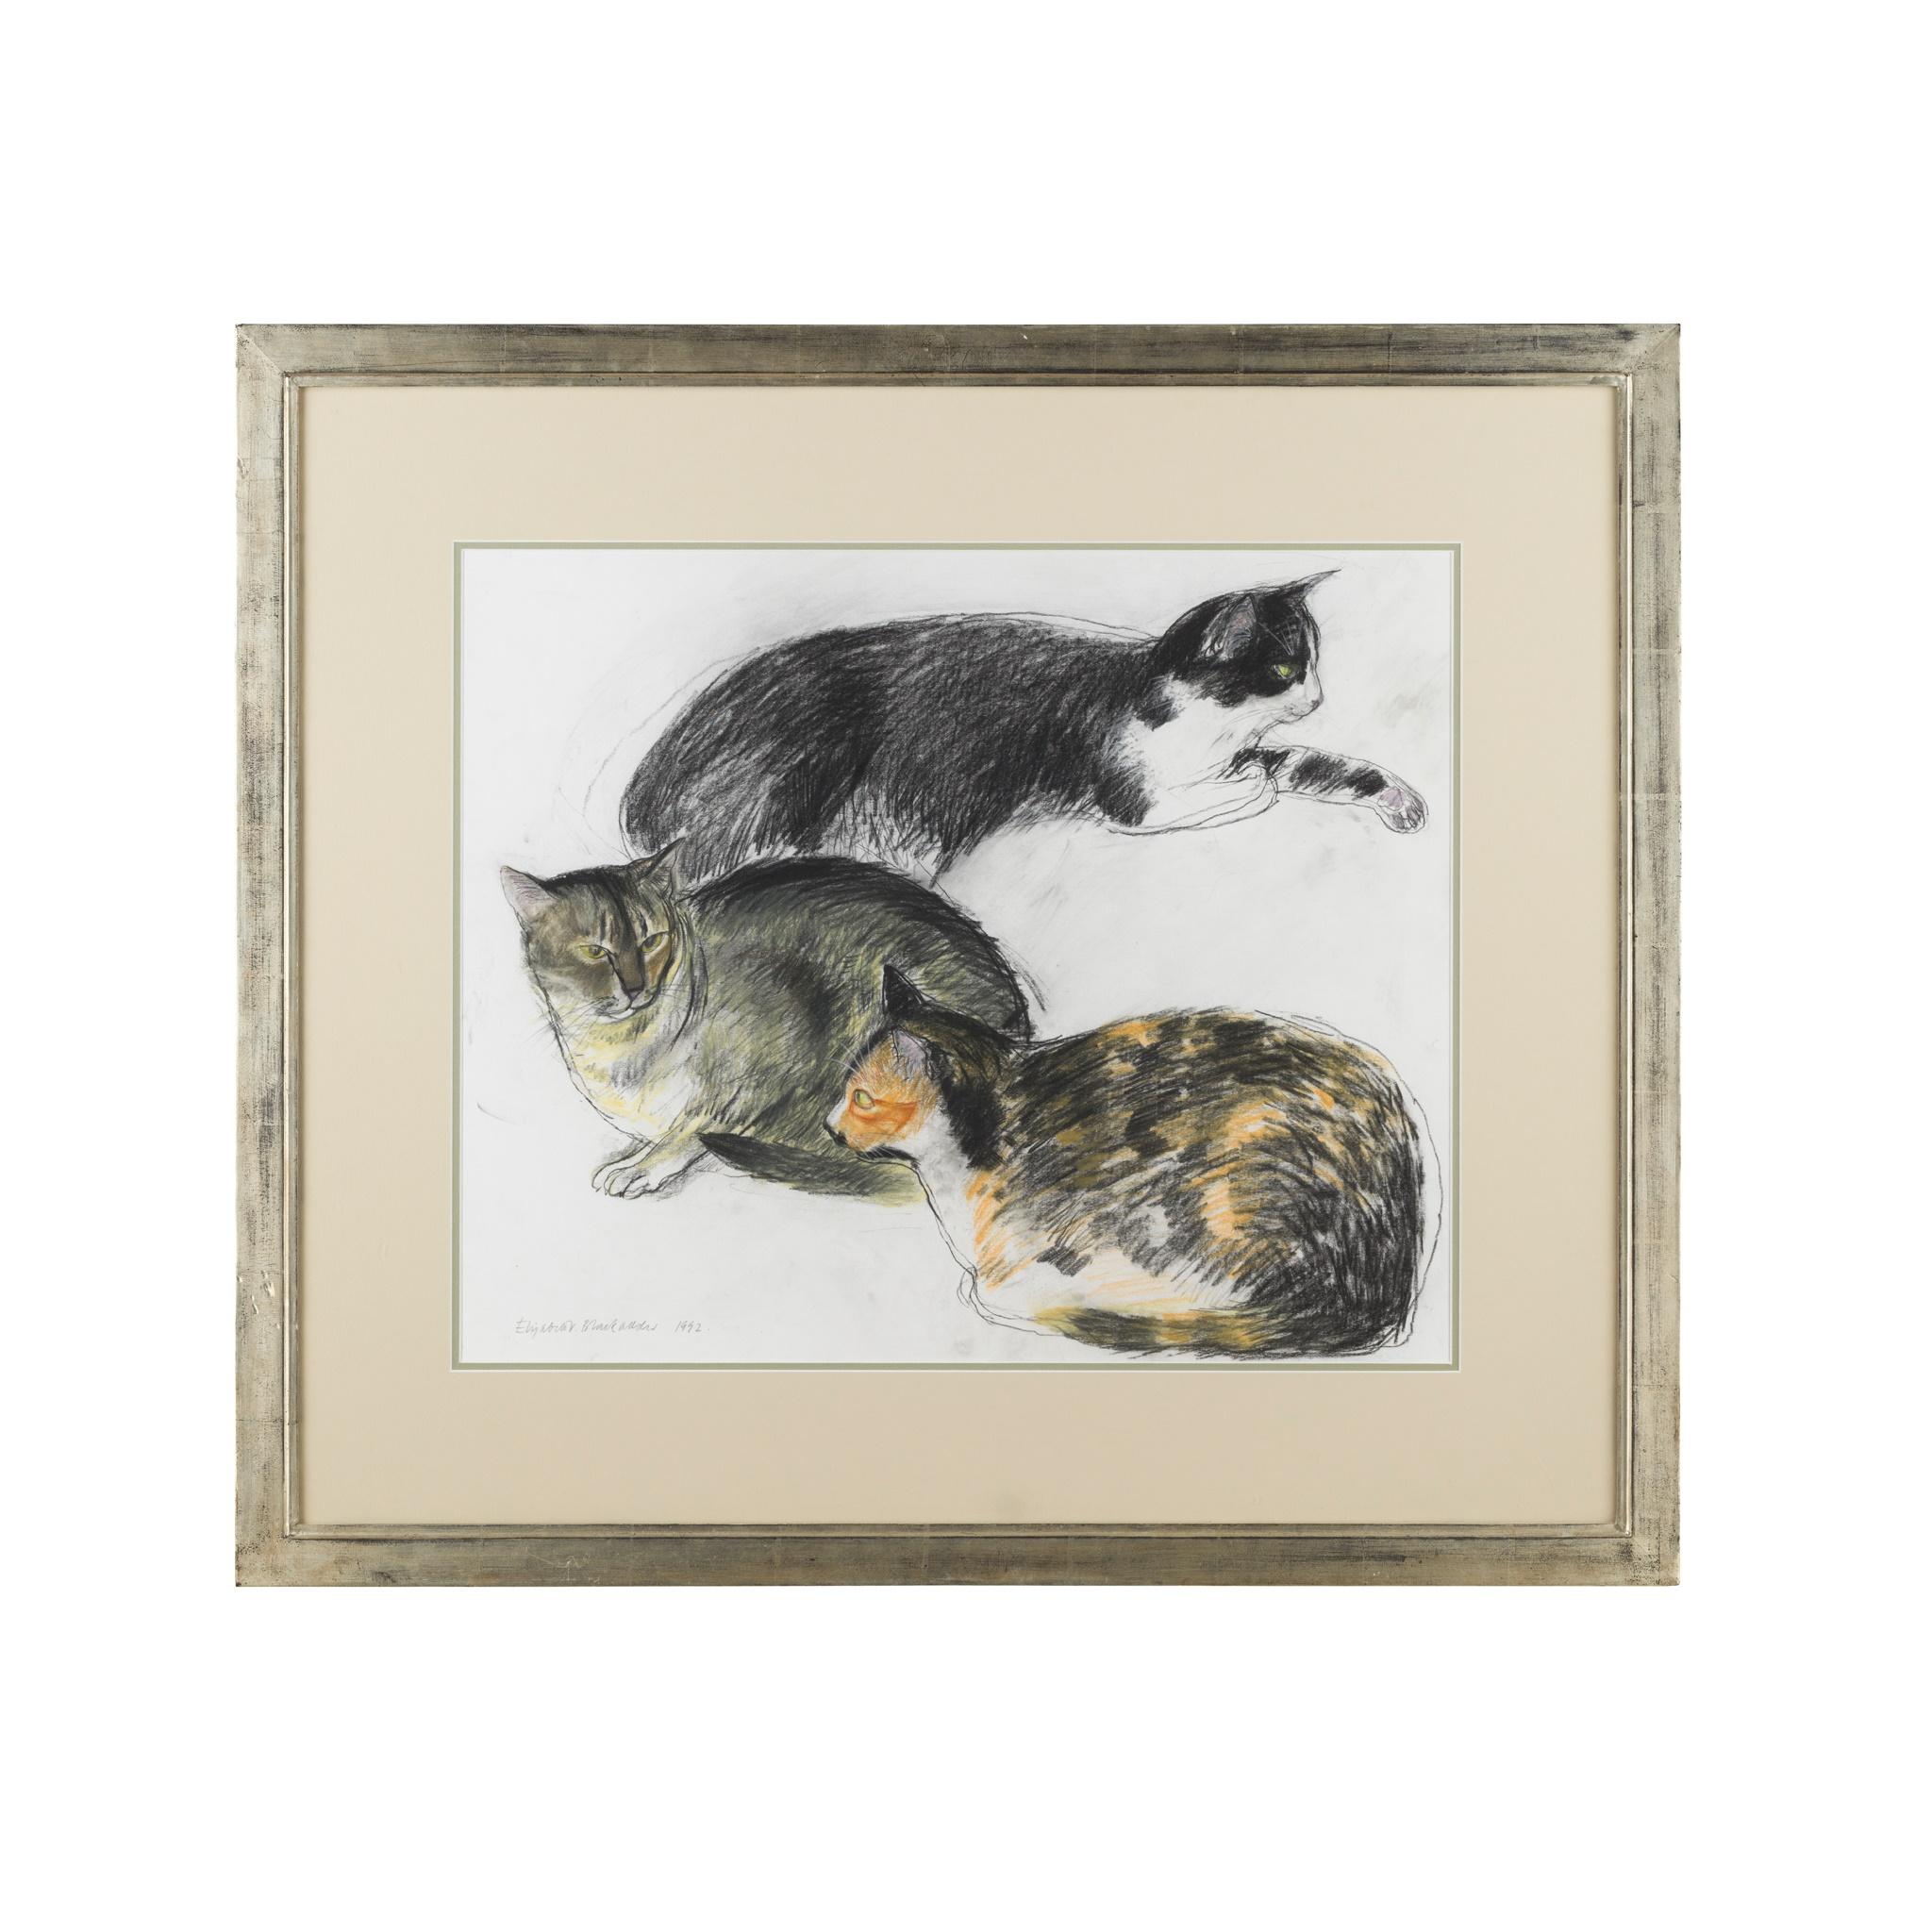 § ELIZABETH BLACKADDER O.B.E., R.A., R.S.A., R.S.W., R.G.I., D.Litt (SCOTTISH B.1931) THREE CATS - Image 2 of 3